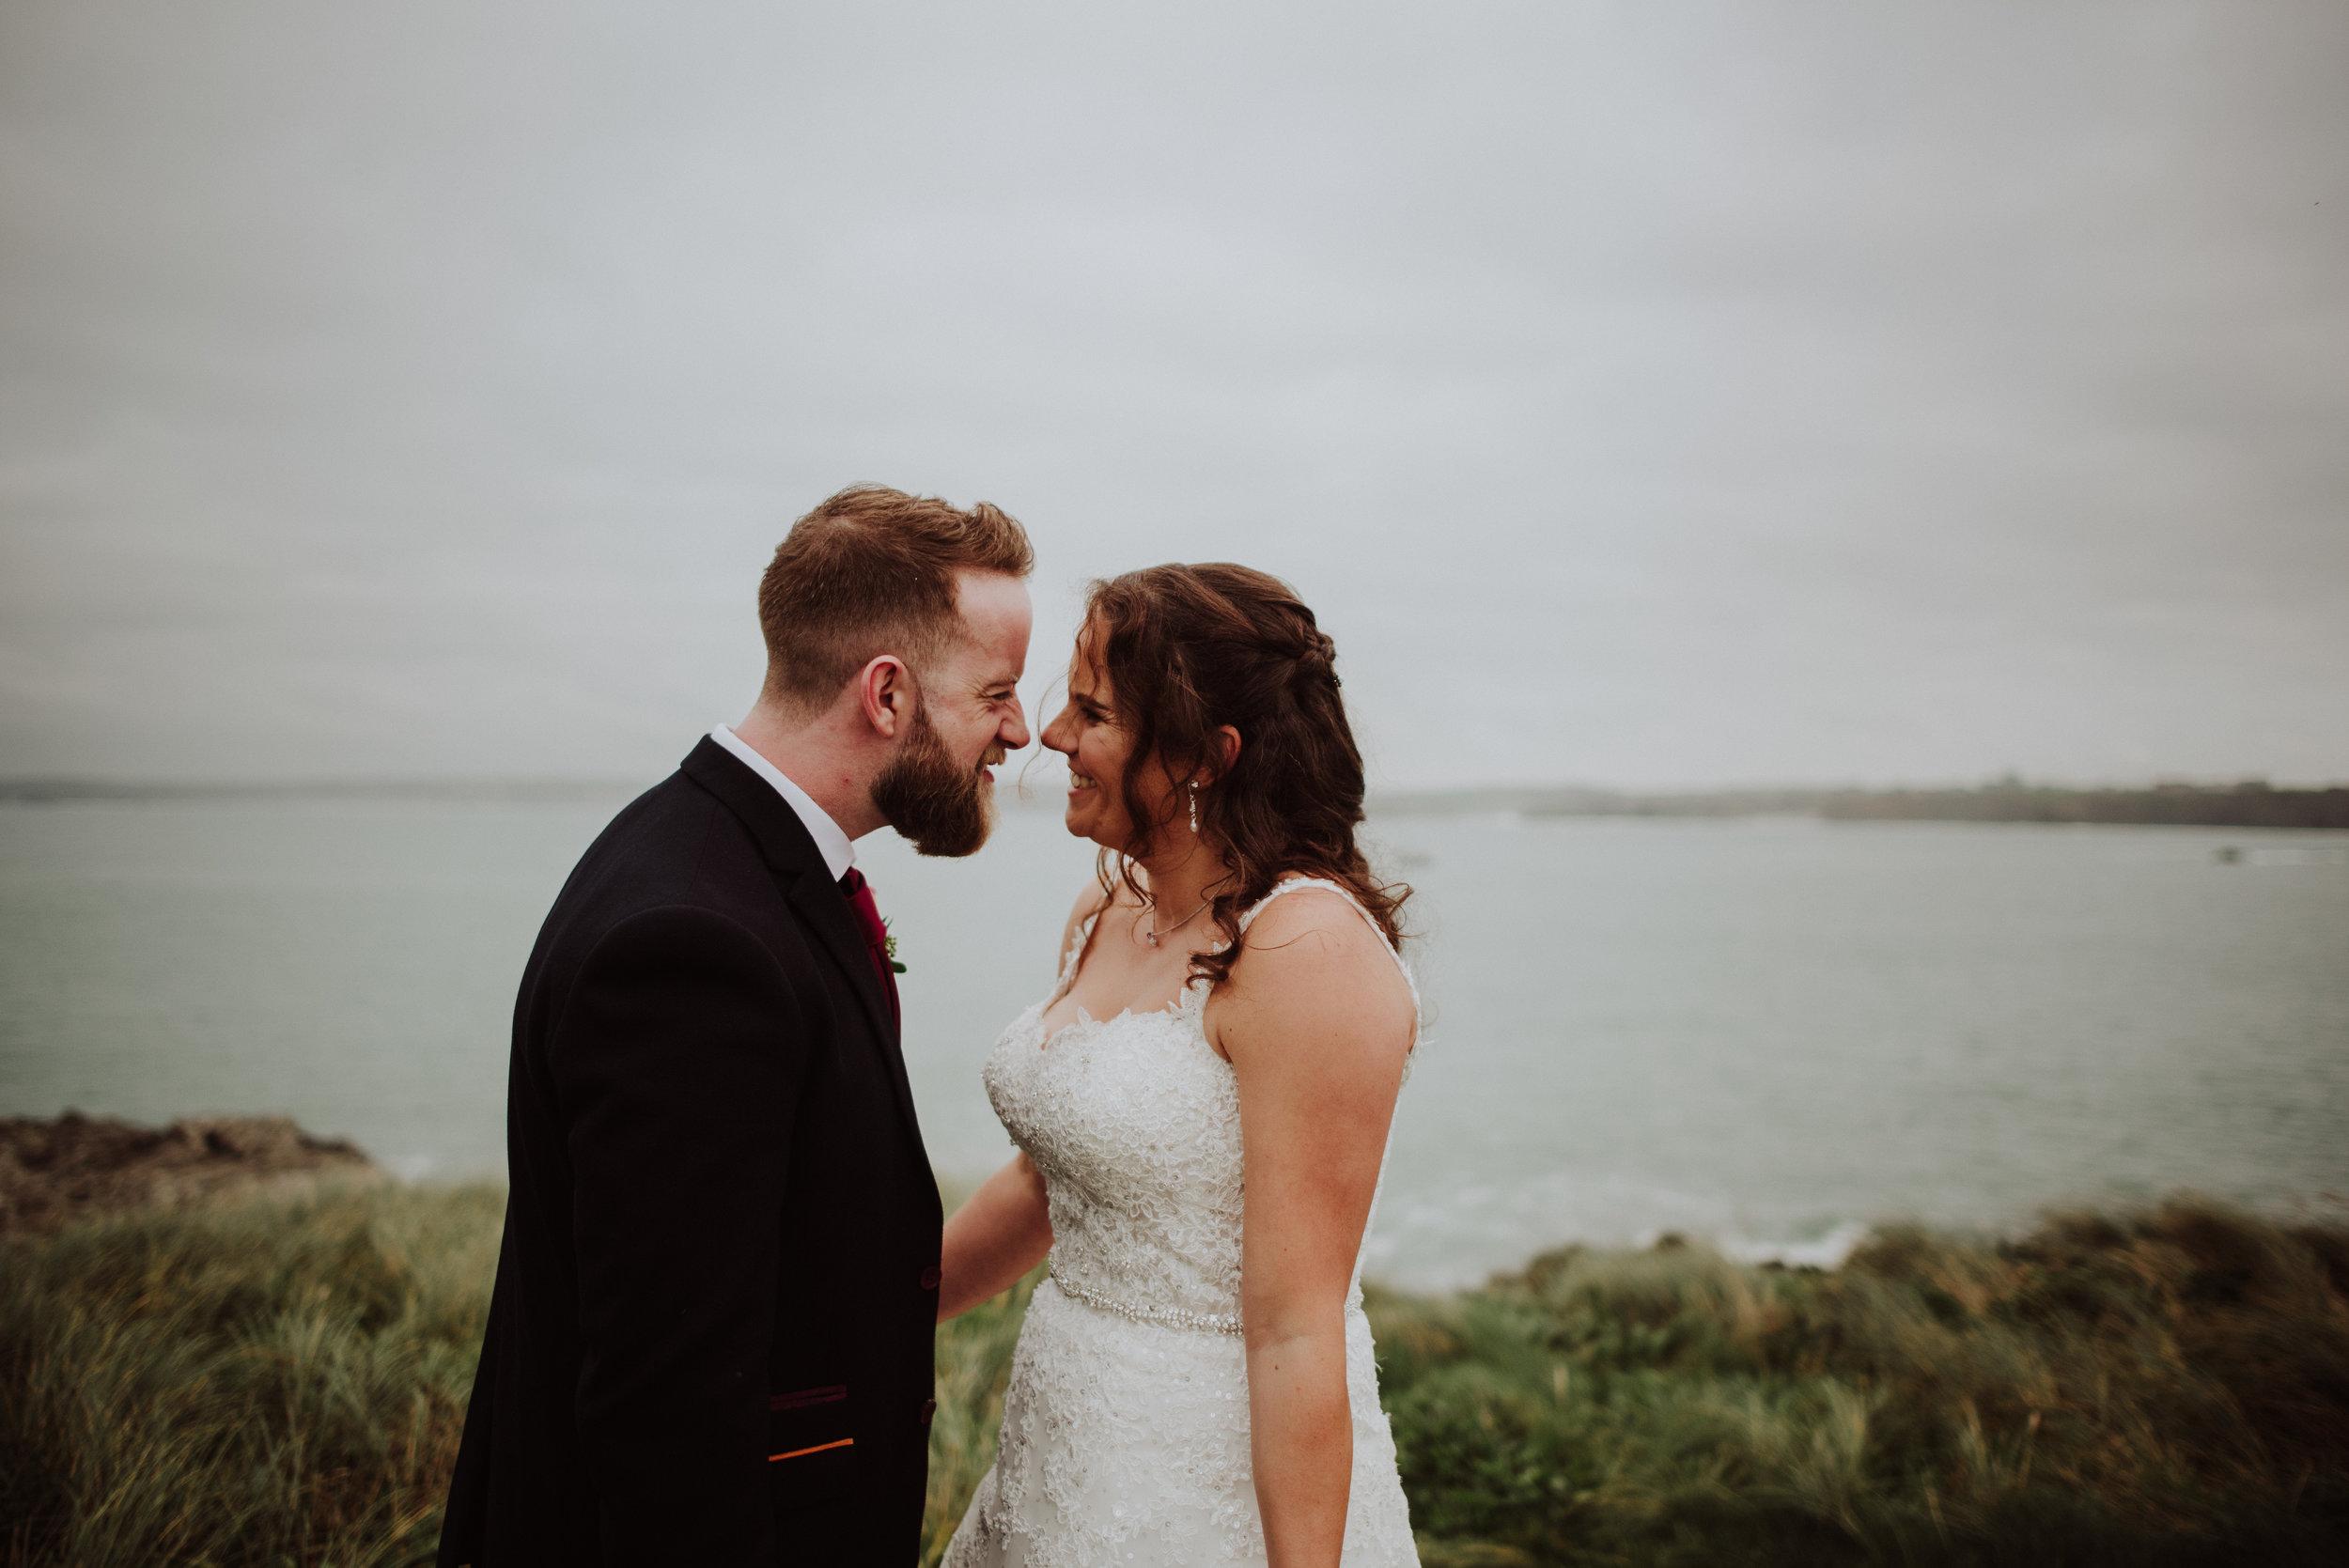 wedding-photographer-cornwall-carnmarth-hotel-newquay-4.jpg